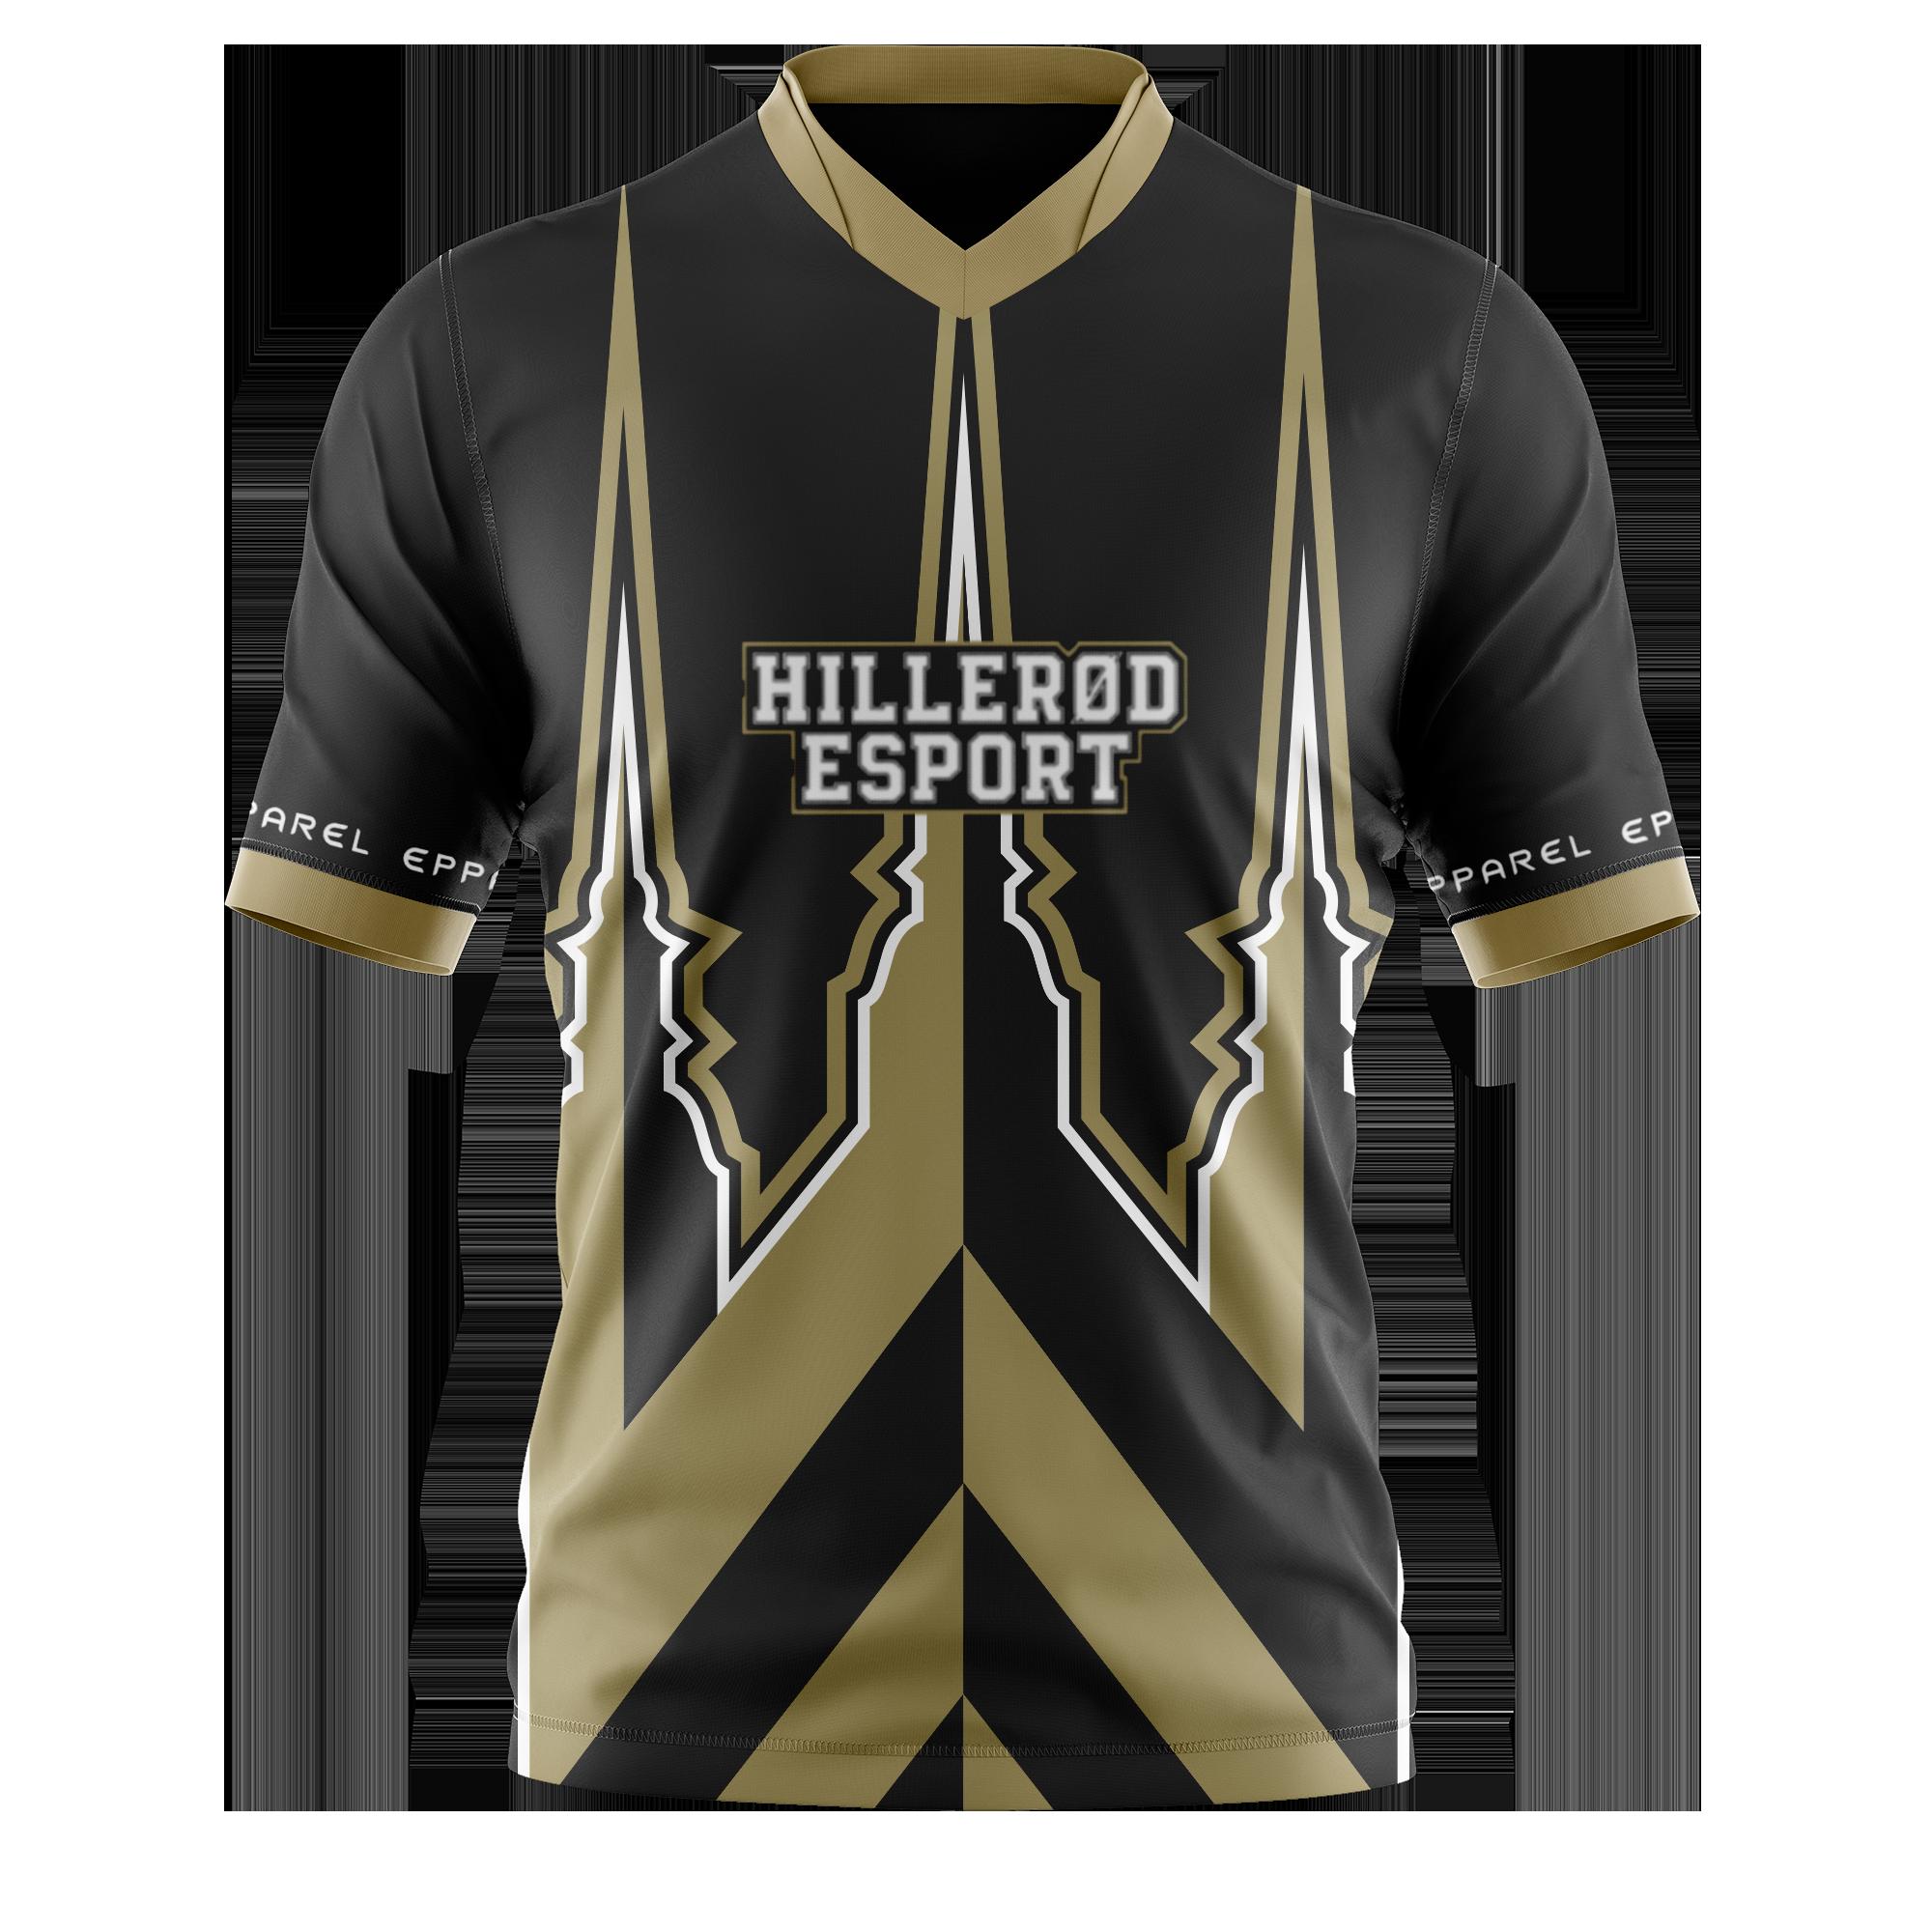 Hillerød Esport Shop